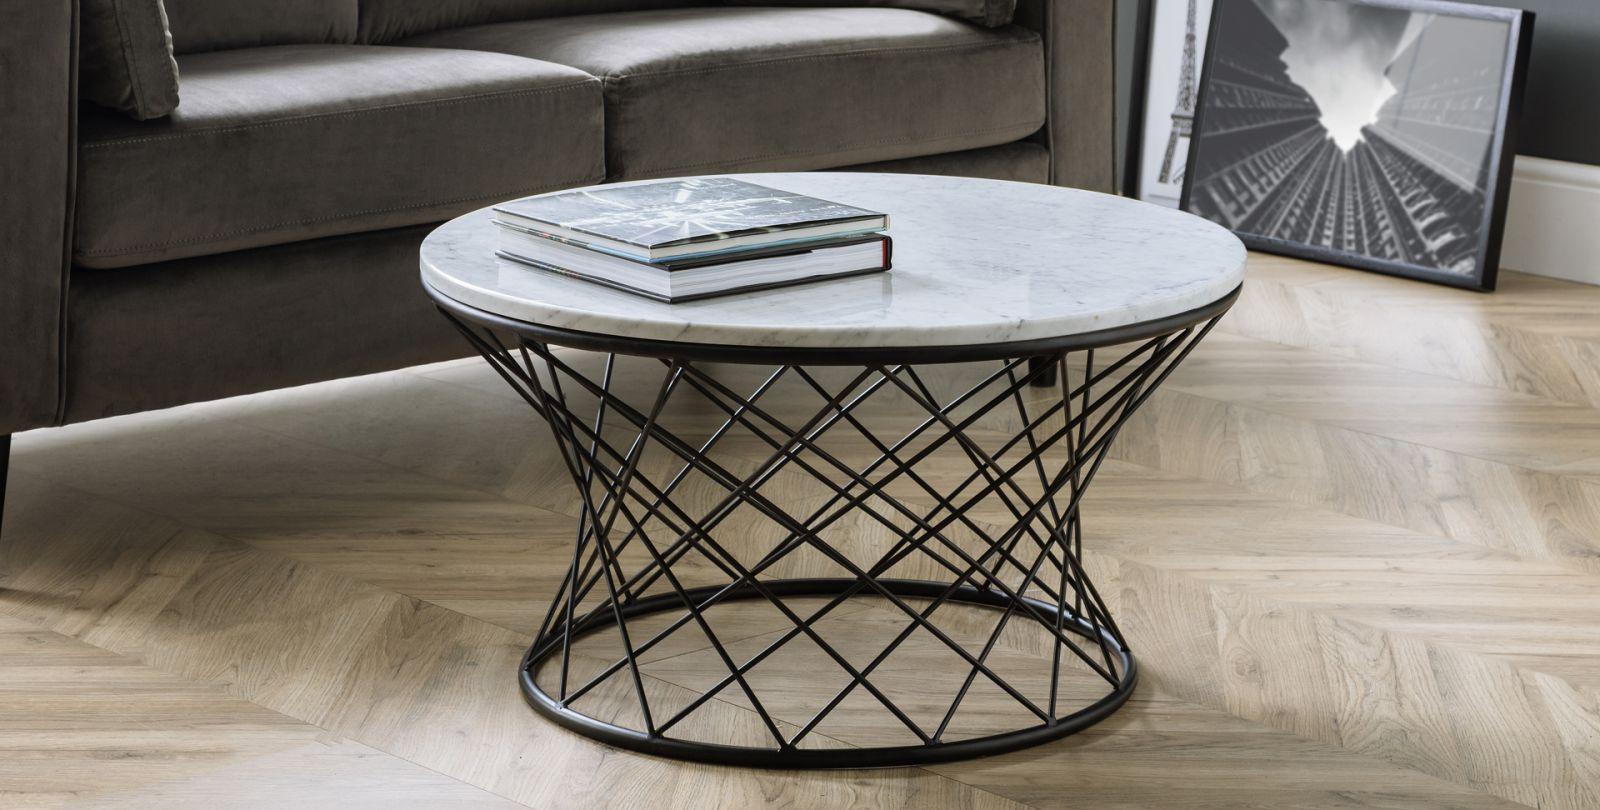 Jual Curve Walnut Black Glass Coffee Table Coffee Tables From Fads [ 1223 x 1545 Pixel ]